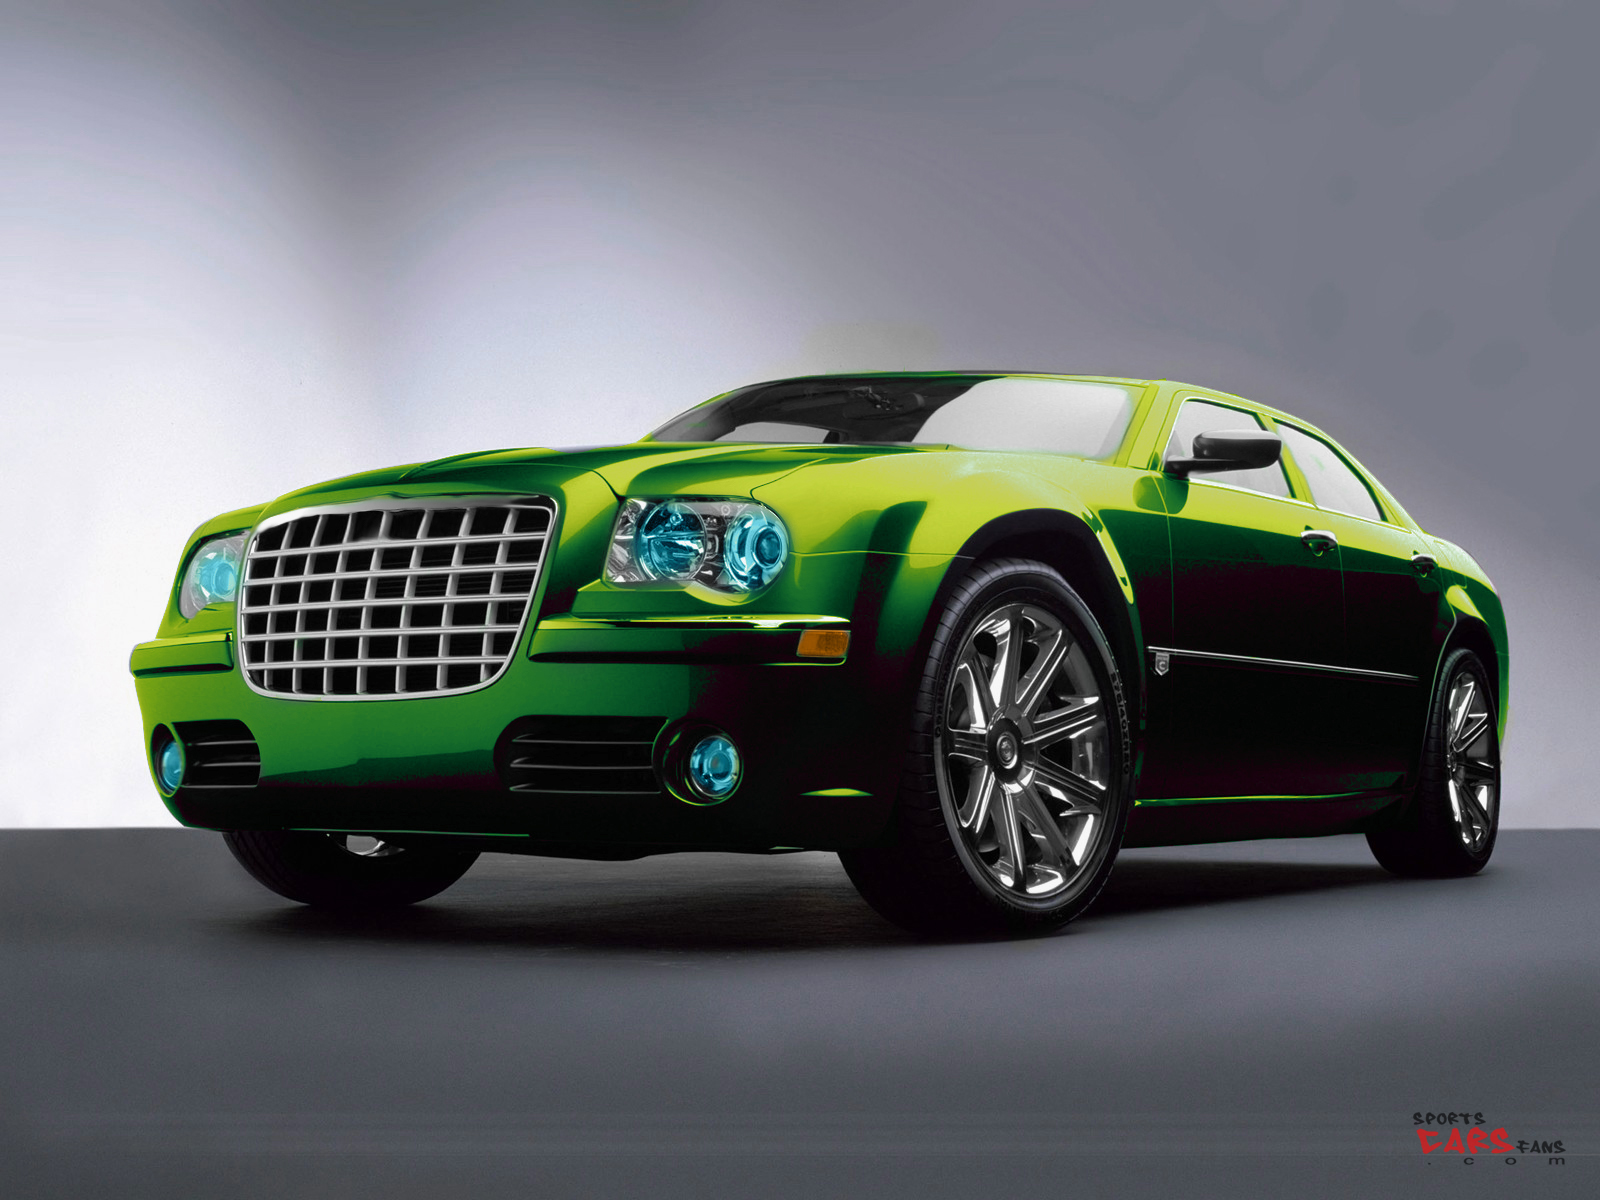 Hd Cool Car Wallpapers Fast Cars: Hd-Car Wallpapers: Cool Cars Wallpapers